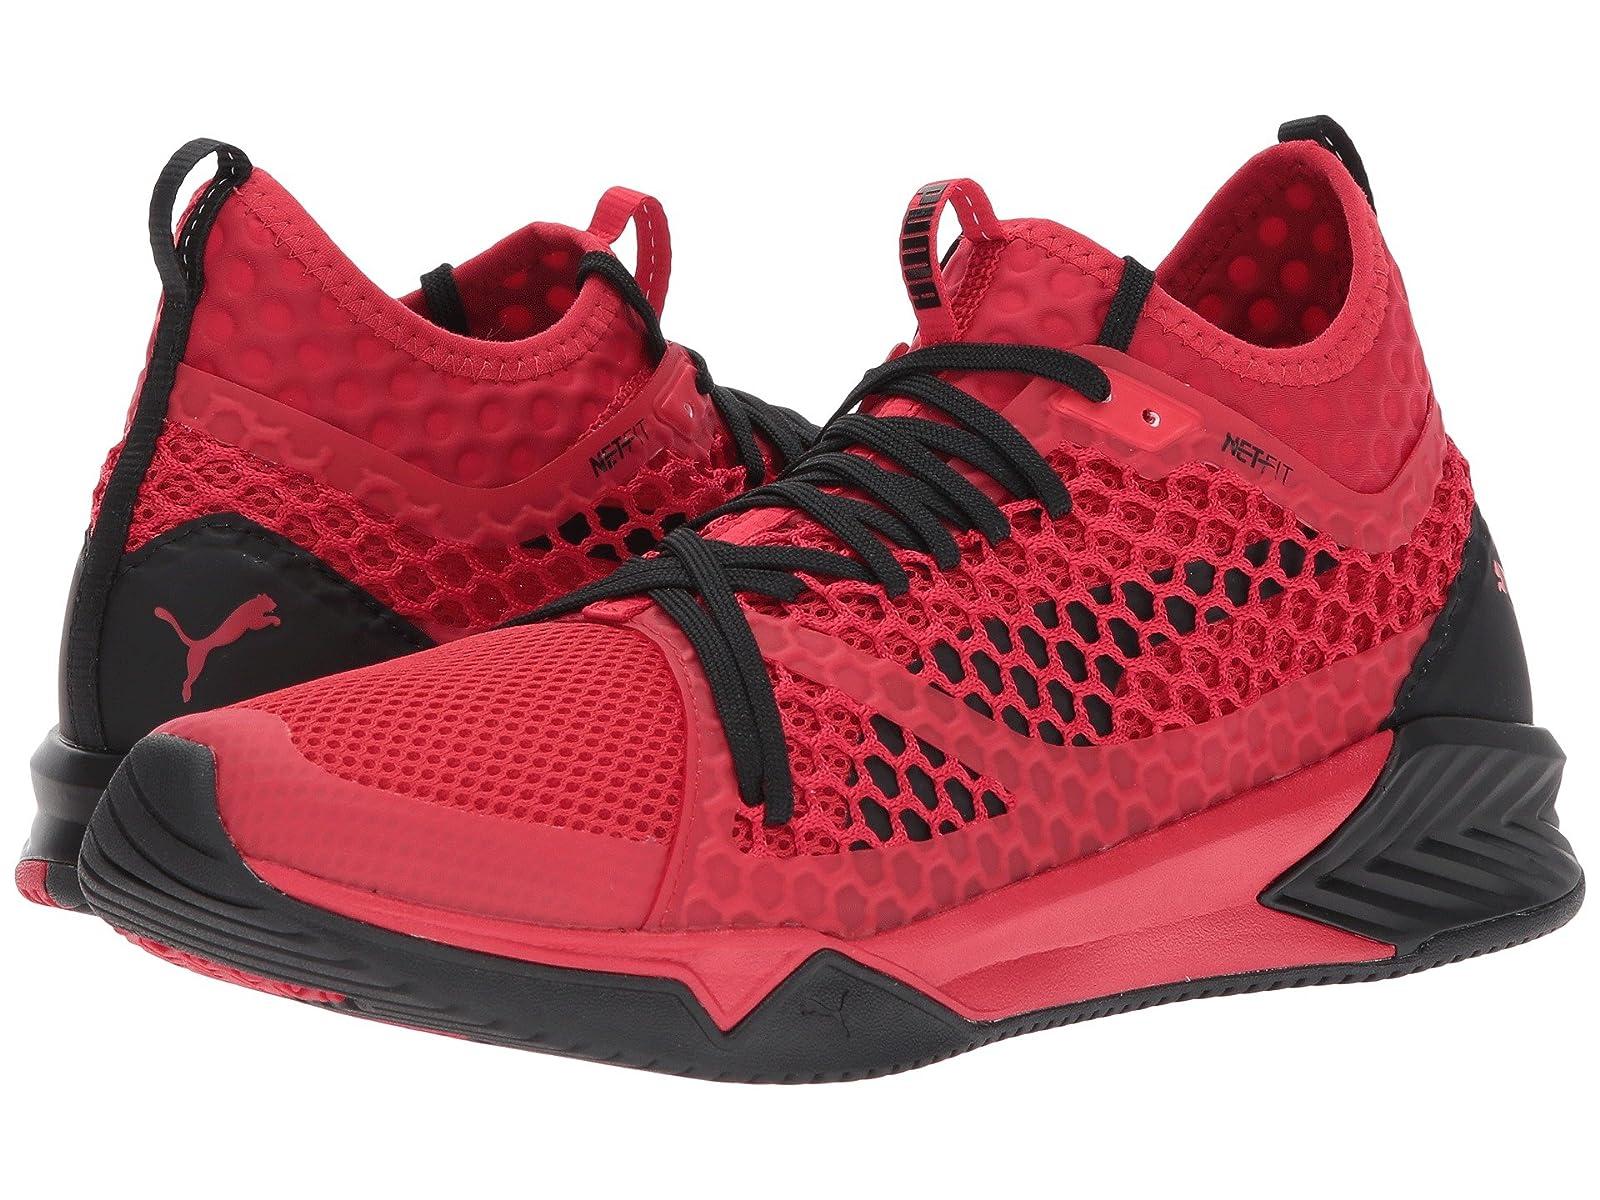 PUMA Ignite XT NetfitCheap and distinctive eye-catching shoes